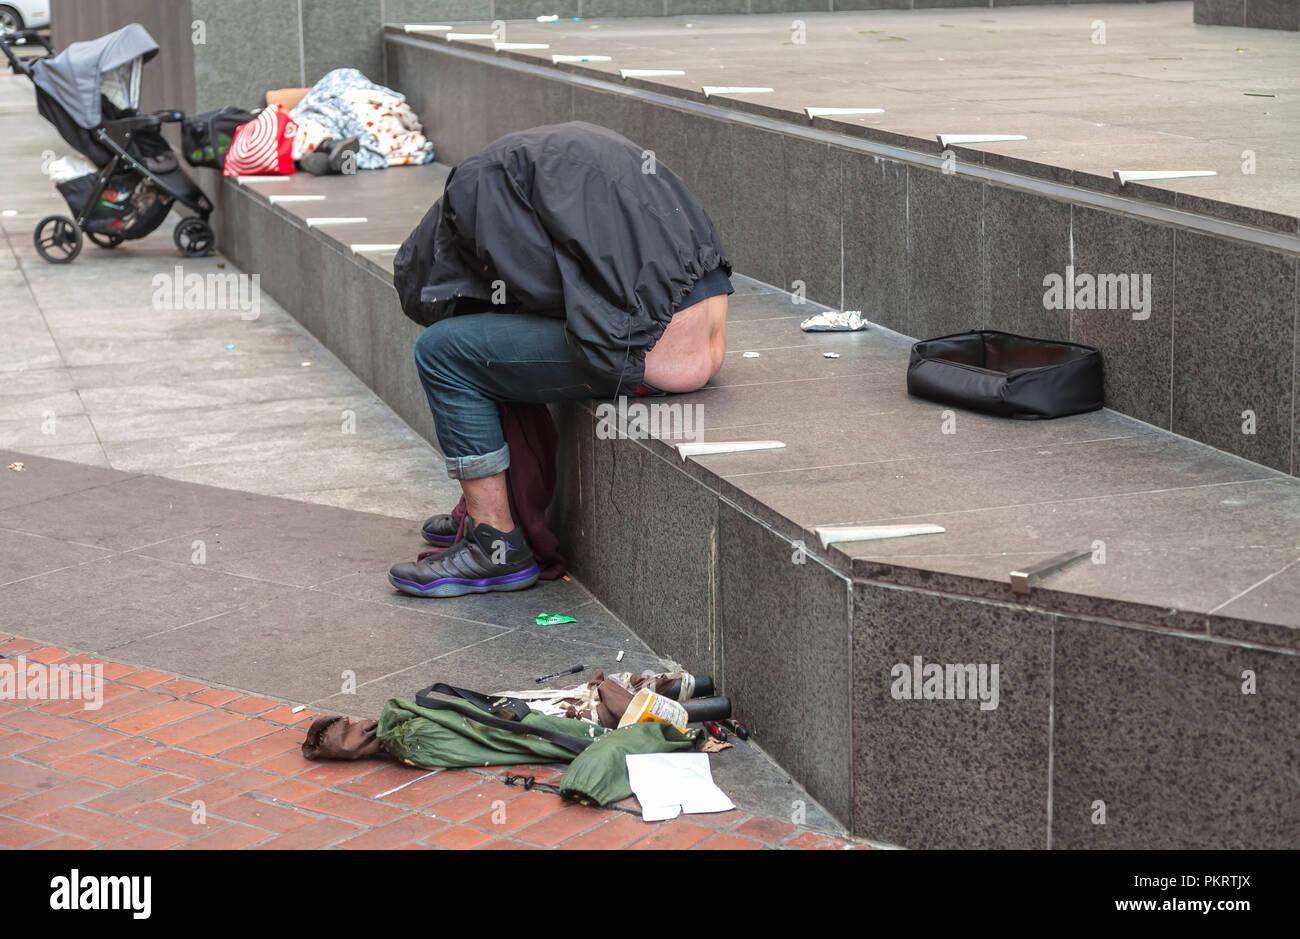 Un hombre sin hogar duerme en la calle Acera en San Francisco, California, Estados Unidos. Imagen De Stock